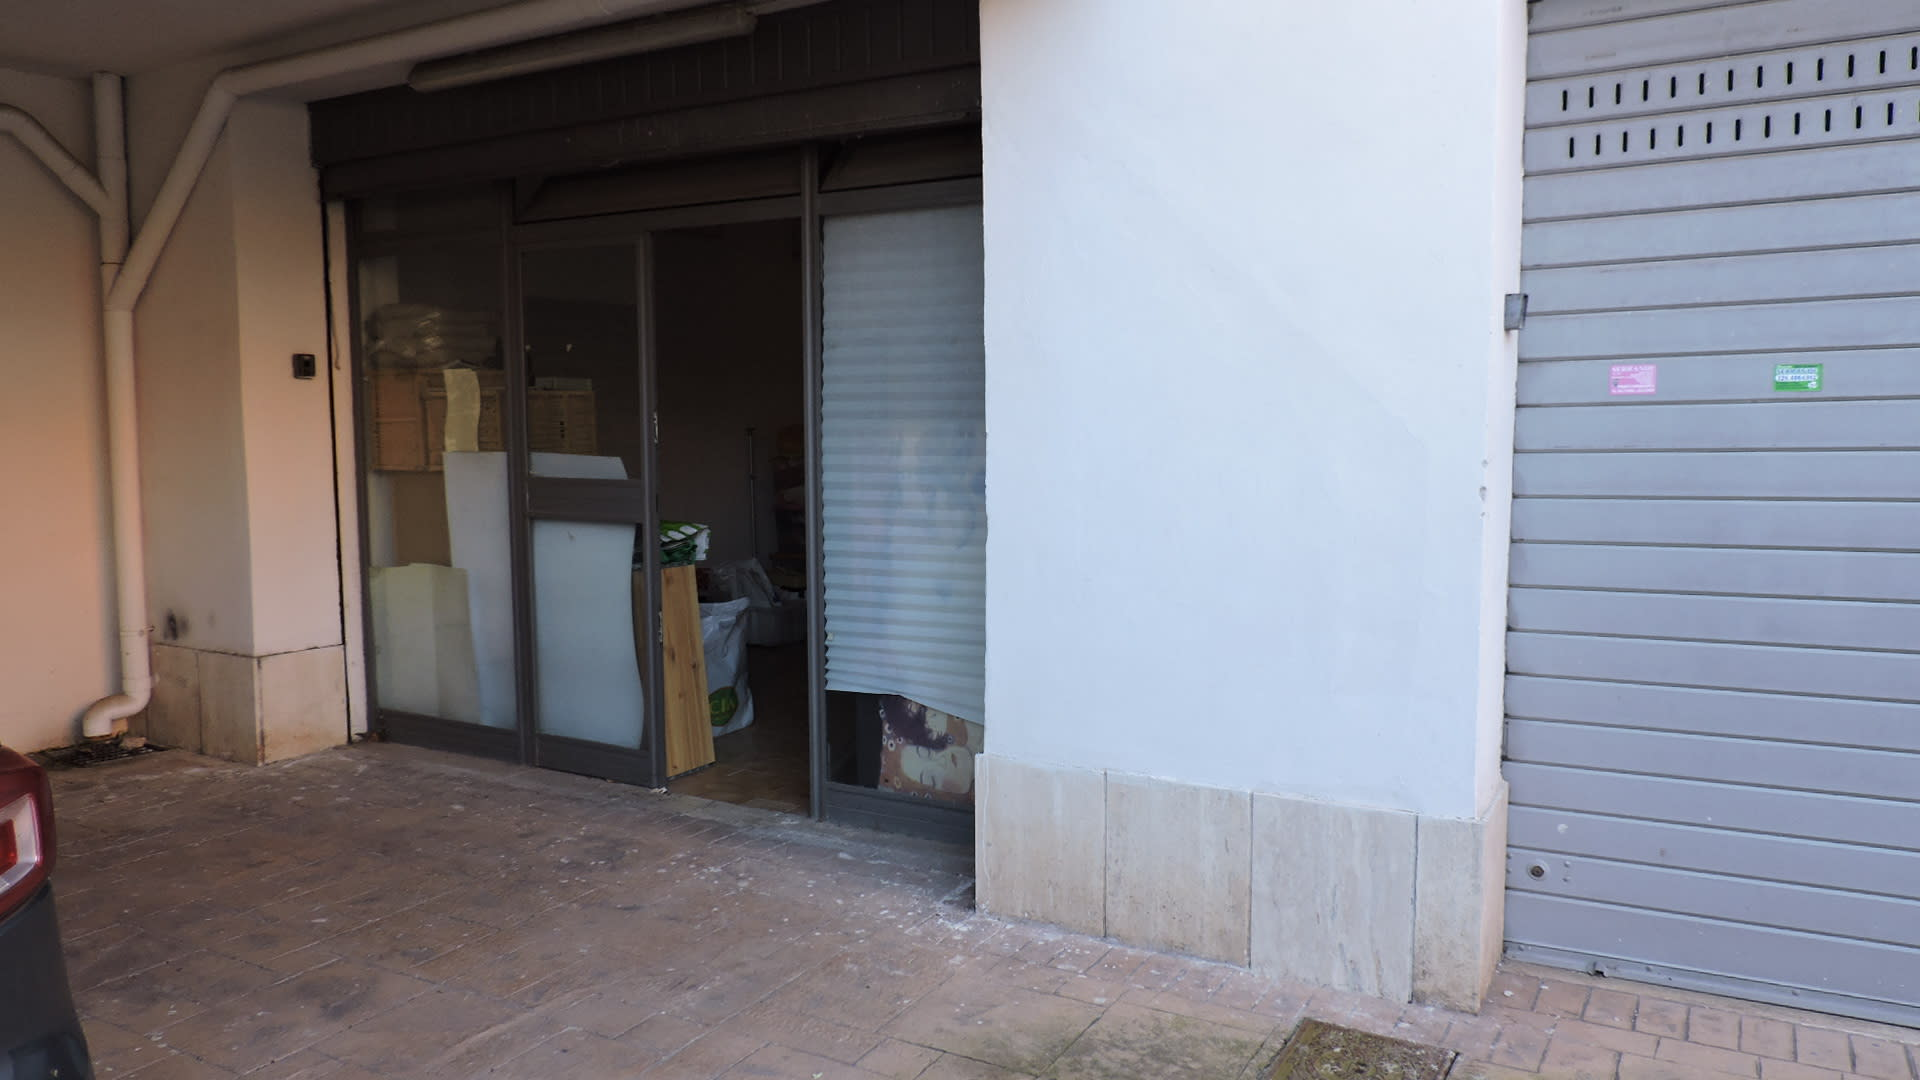 Morena - Locale commerciale ampia metratura